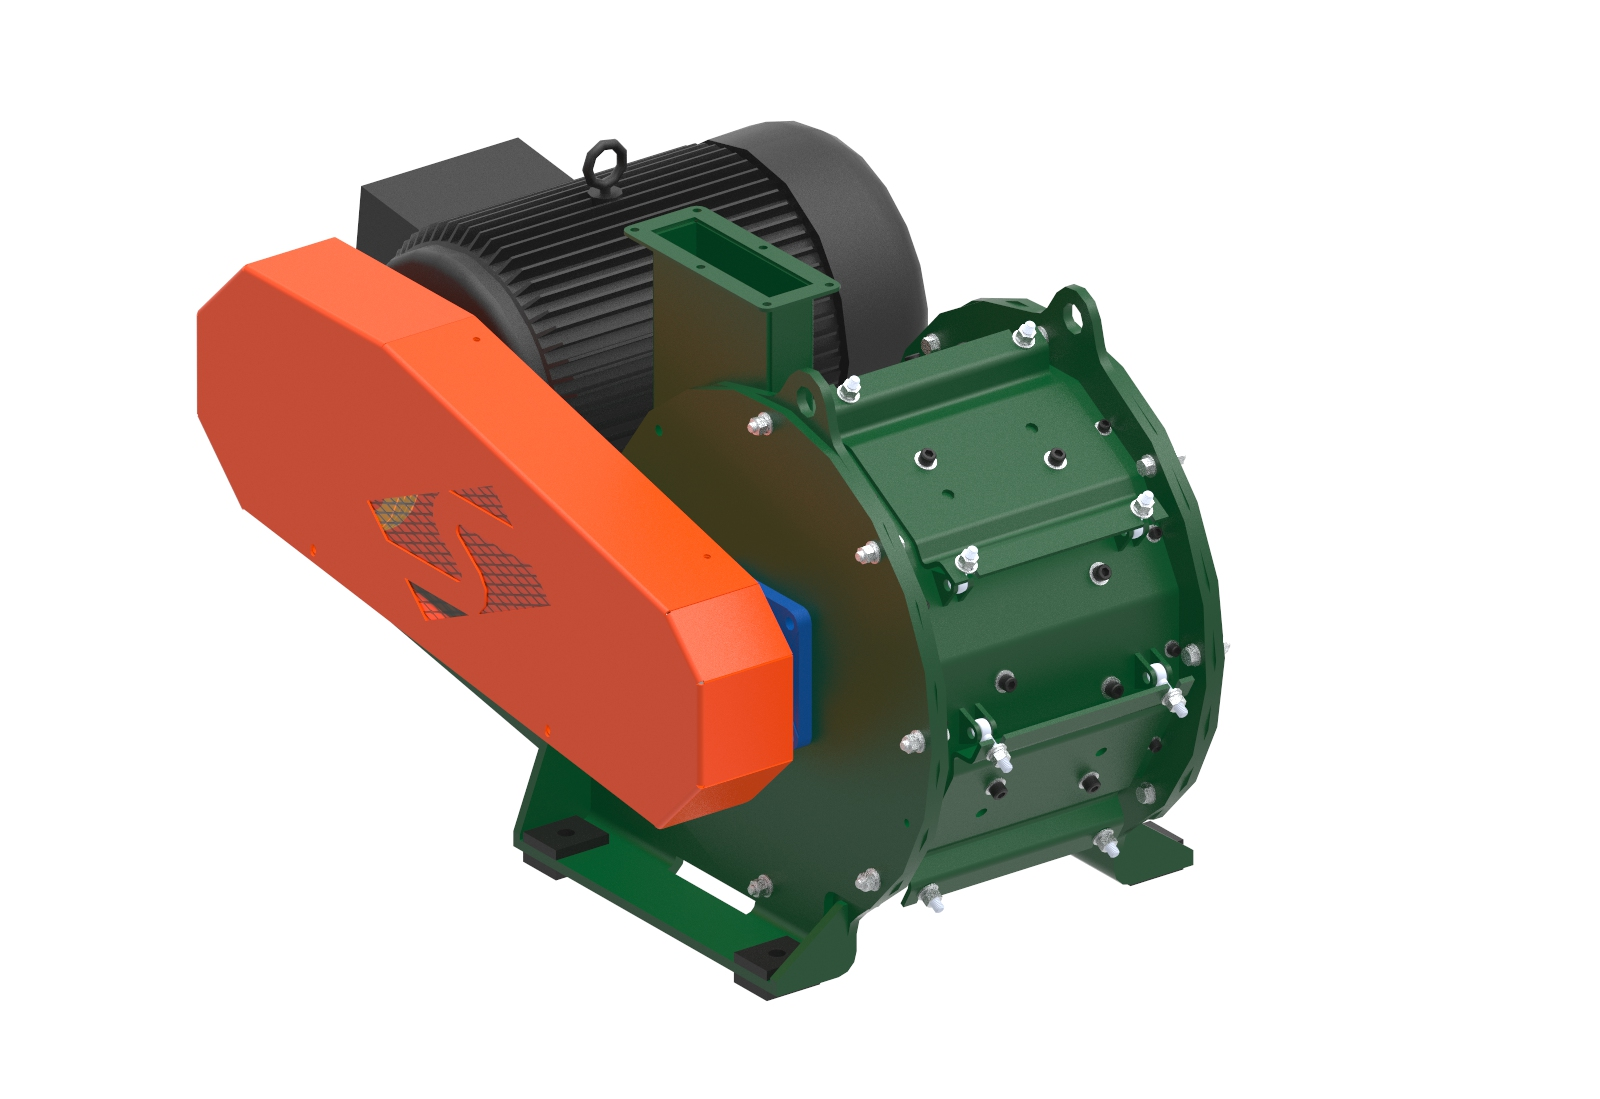 Sweed Turbo Mill Model TM1815